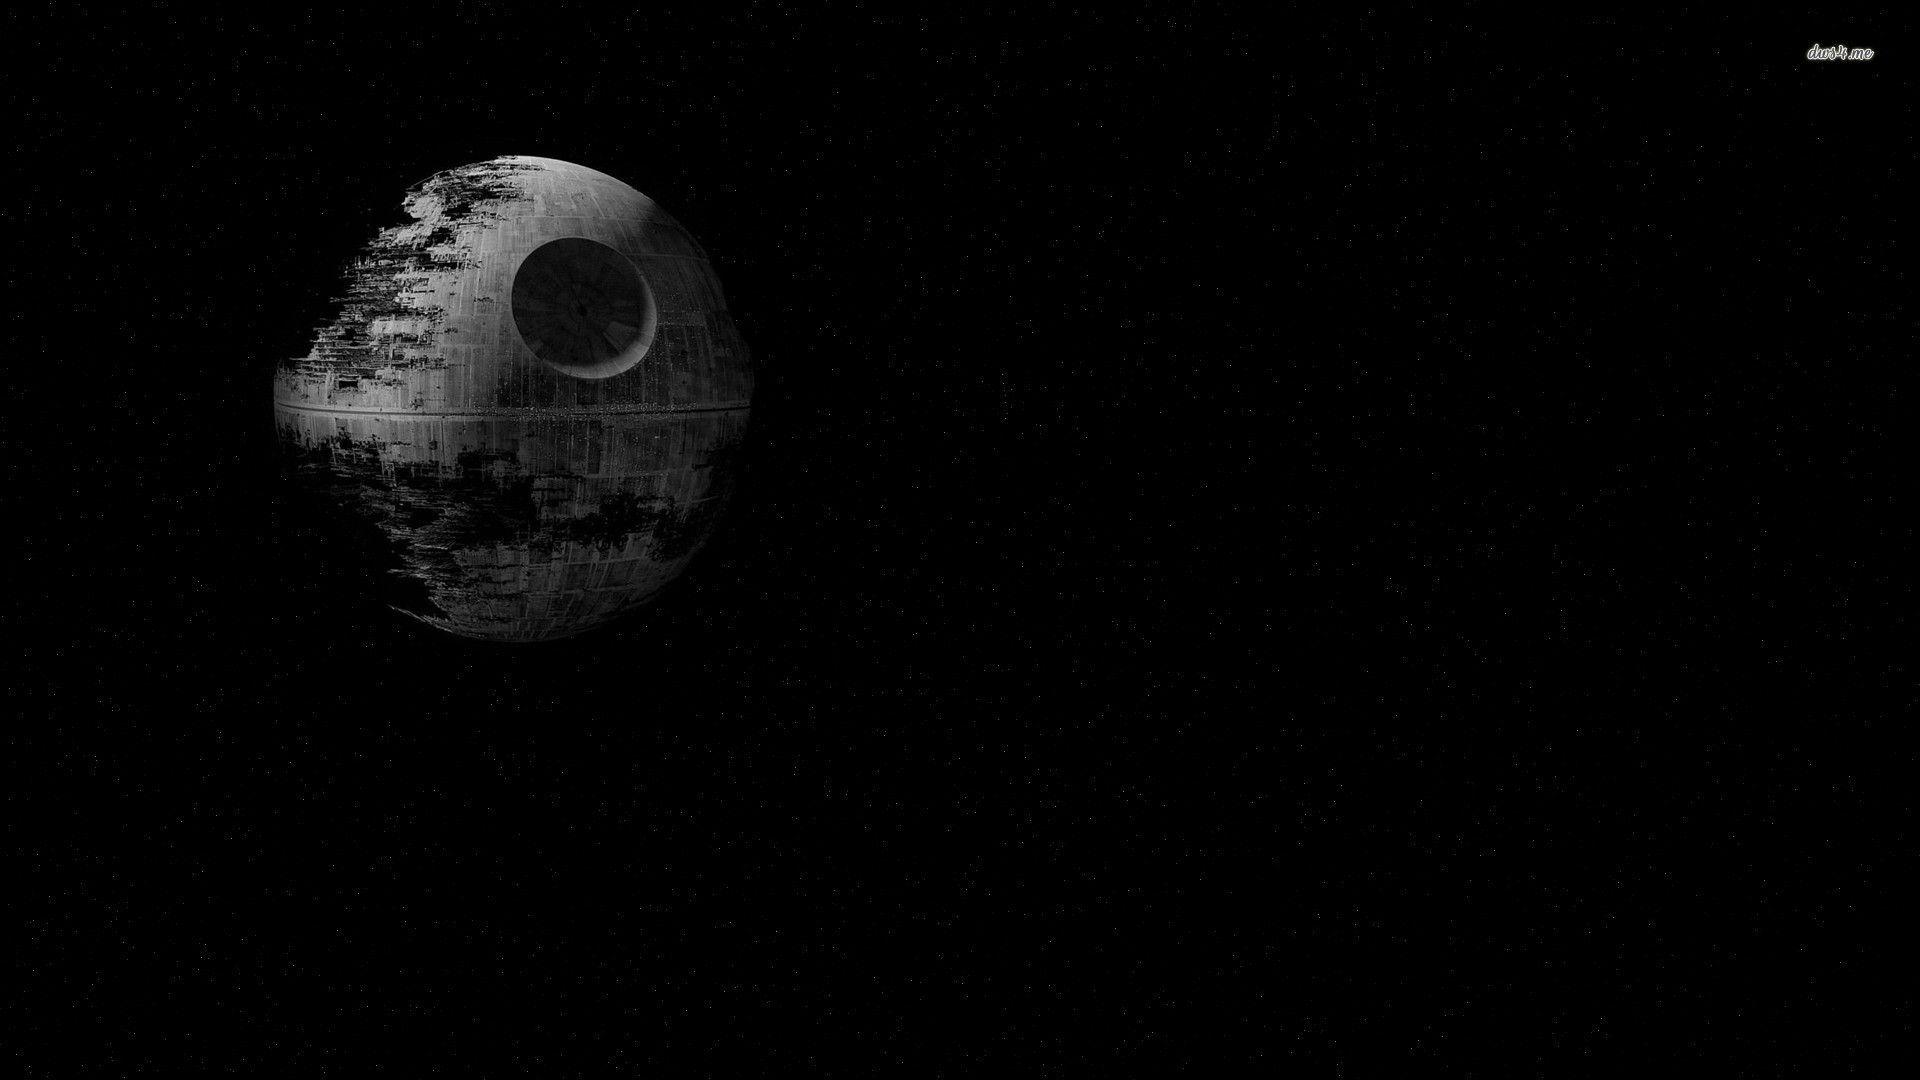 Star Wars Death Star Hd Backgrounds Fizx